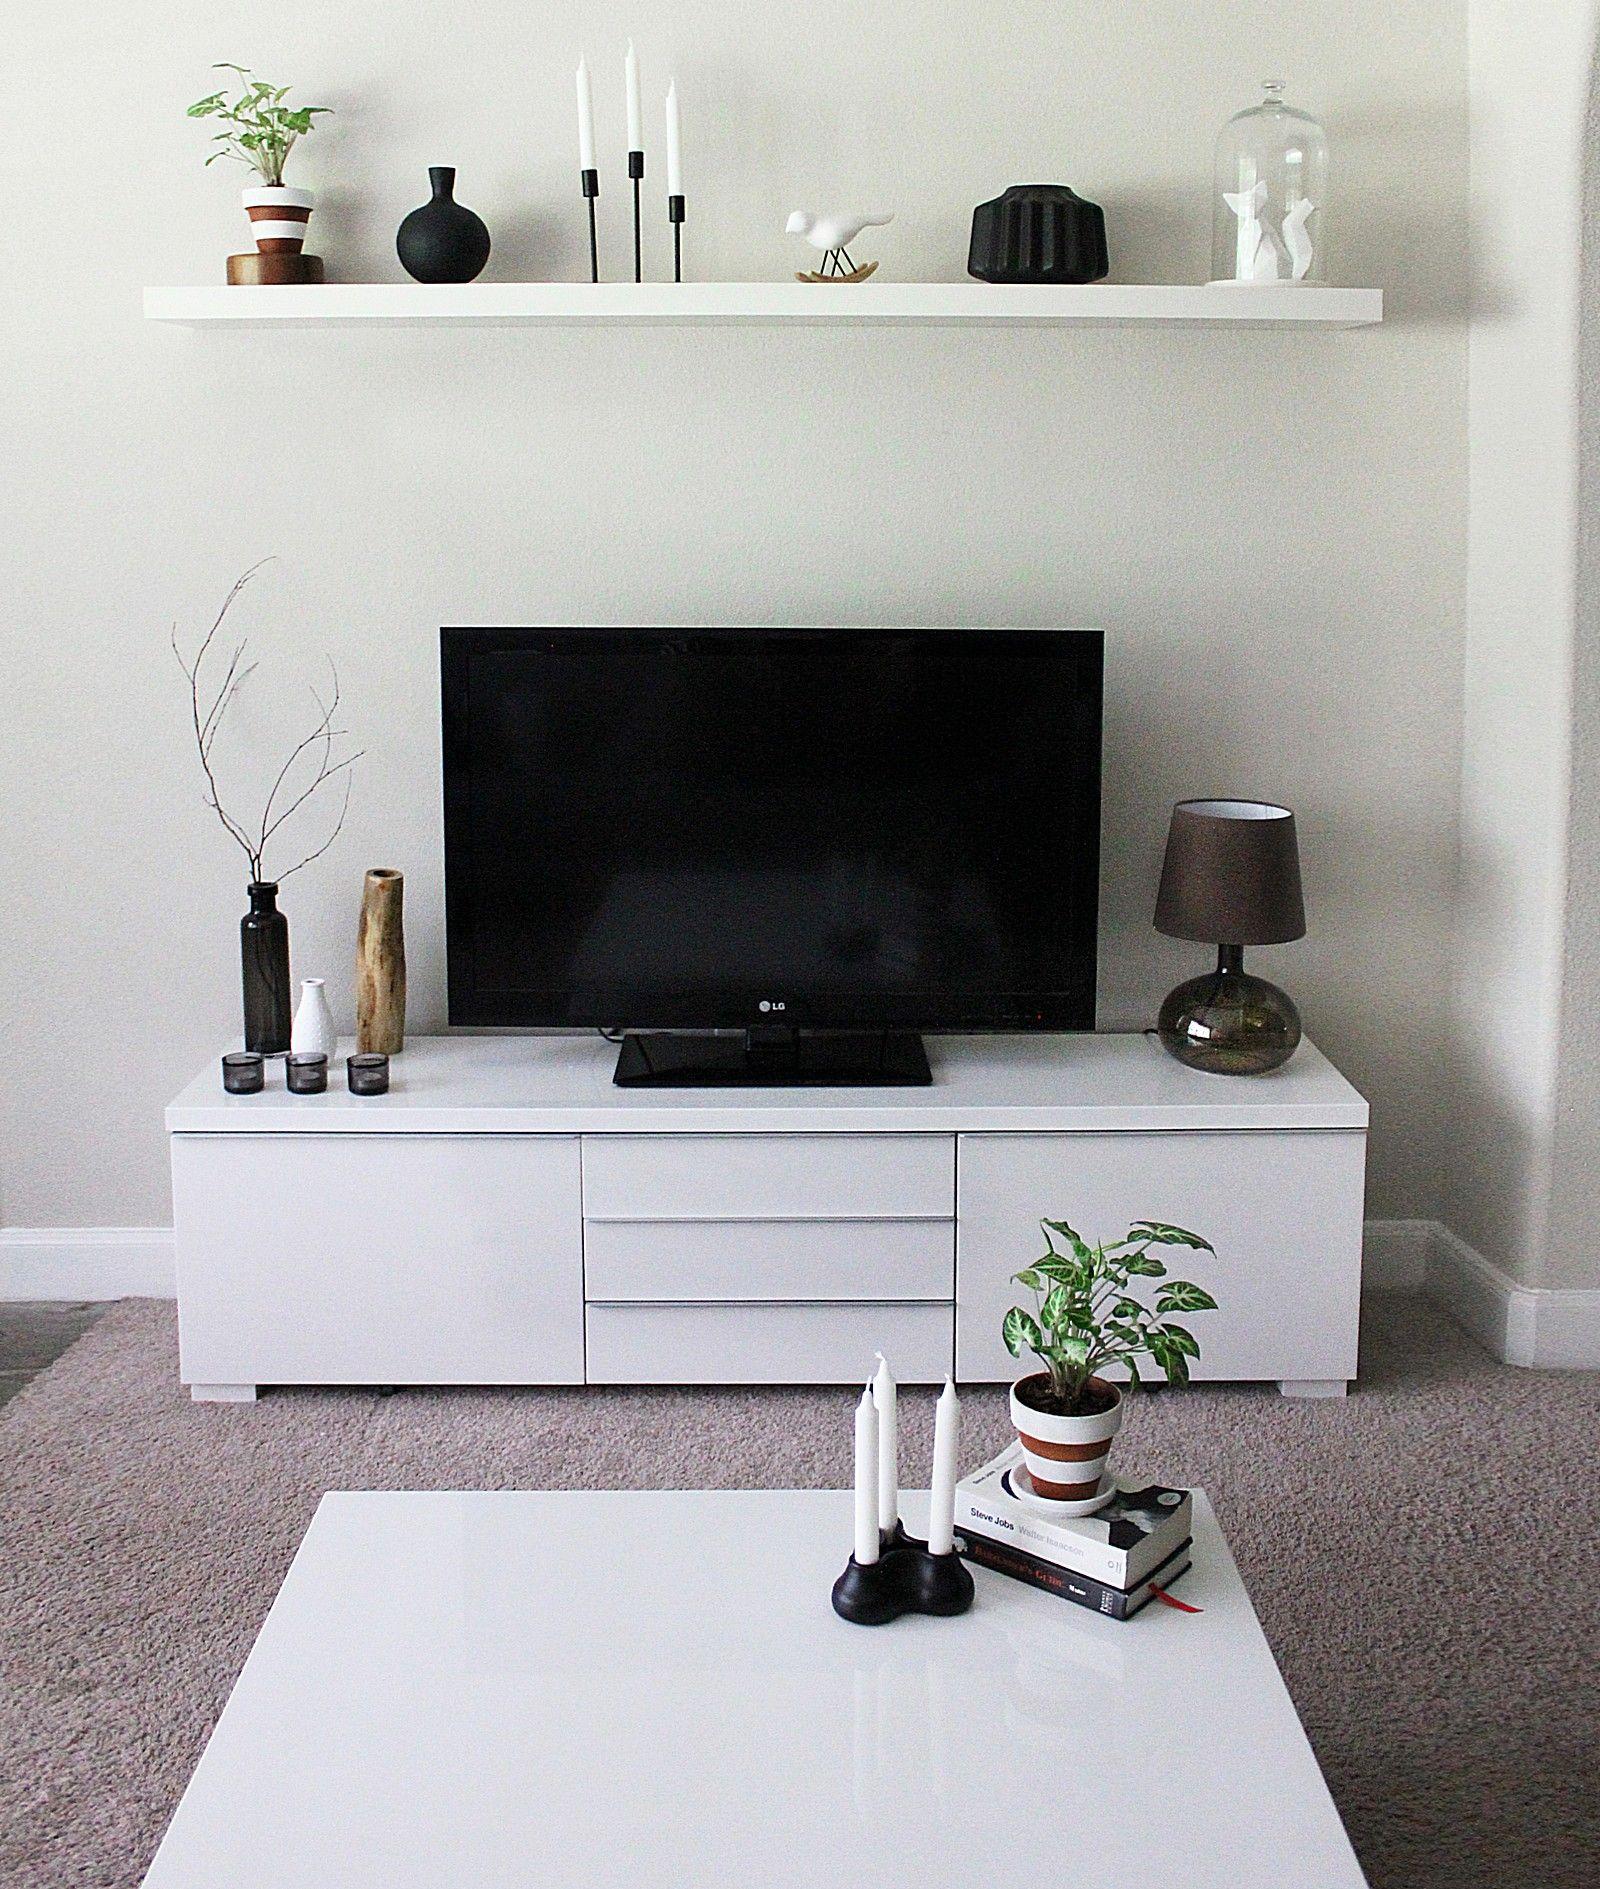 Minimalist TV Stand and Cabinet IKEA Besta  Interiors